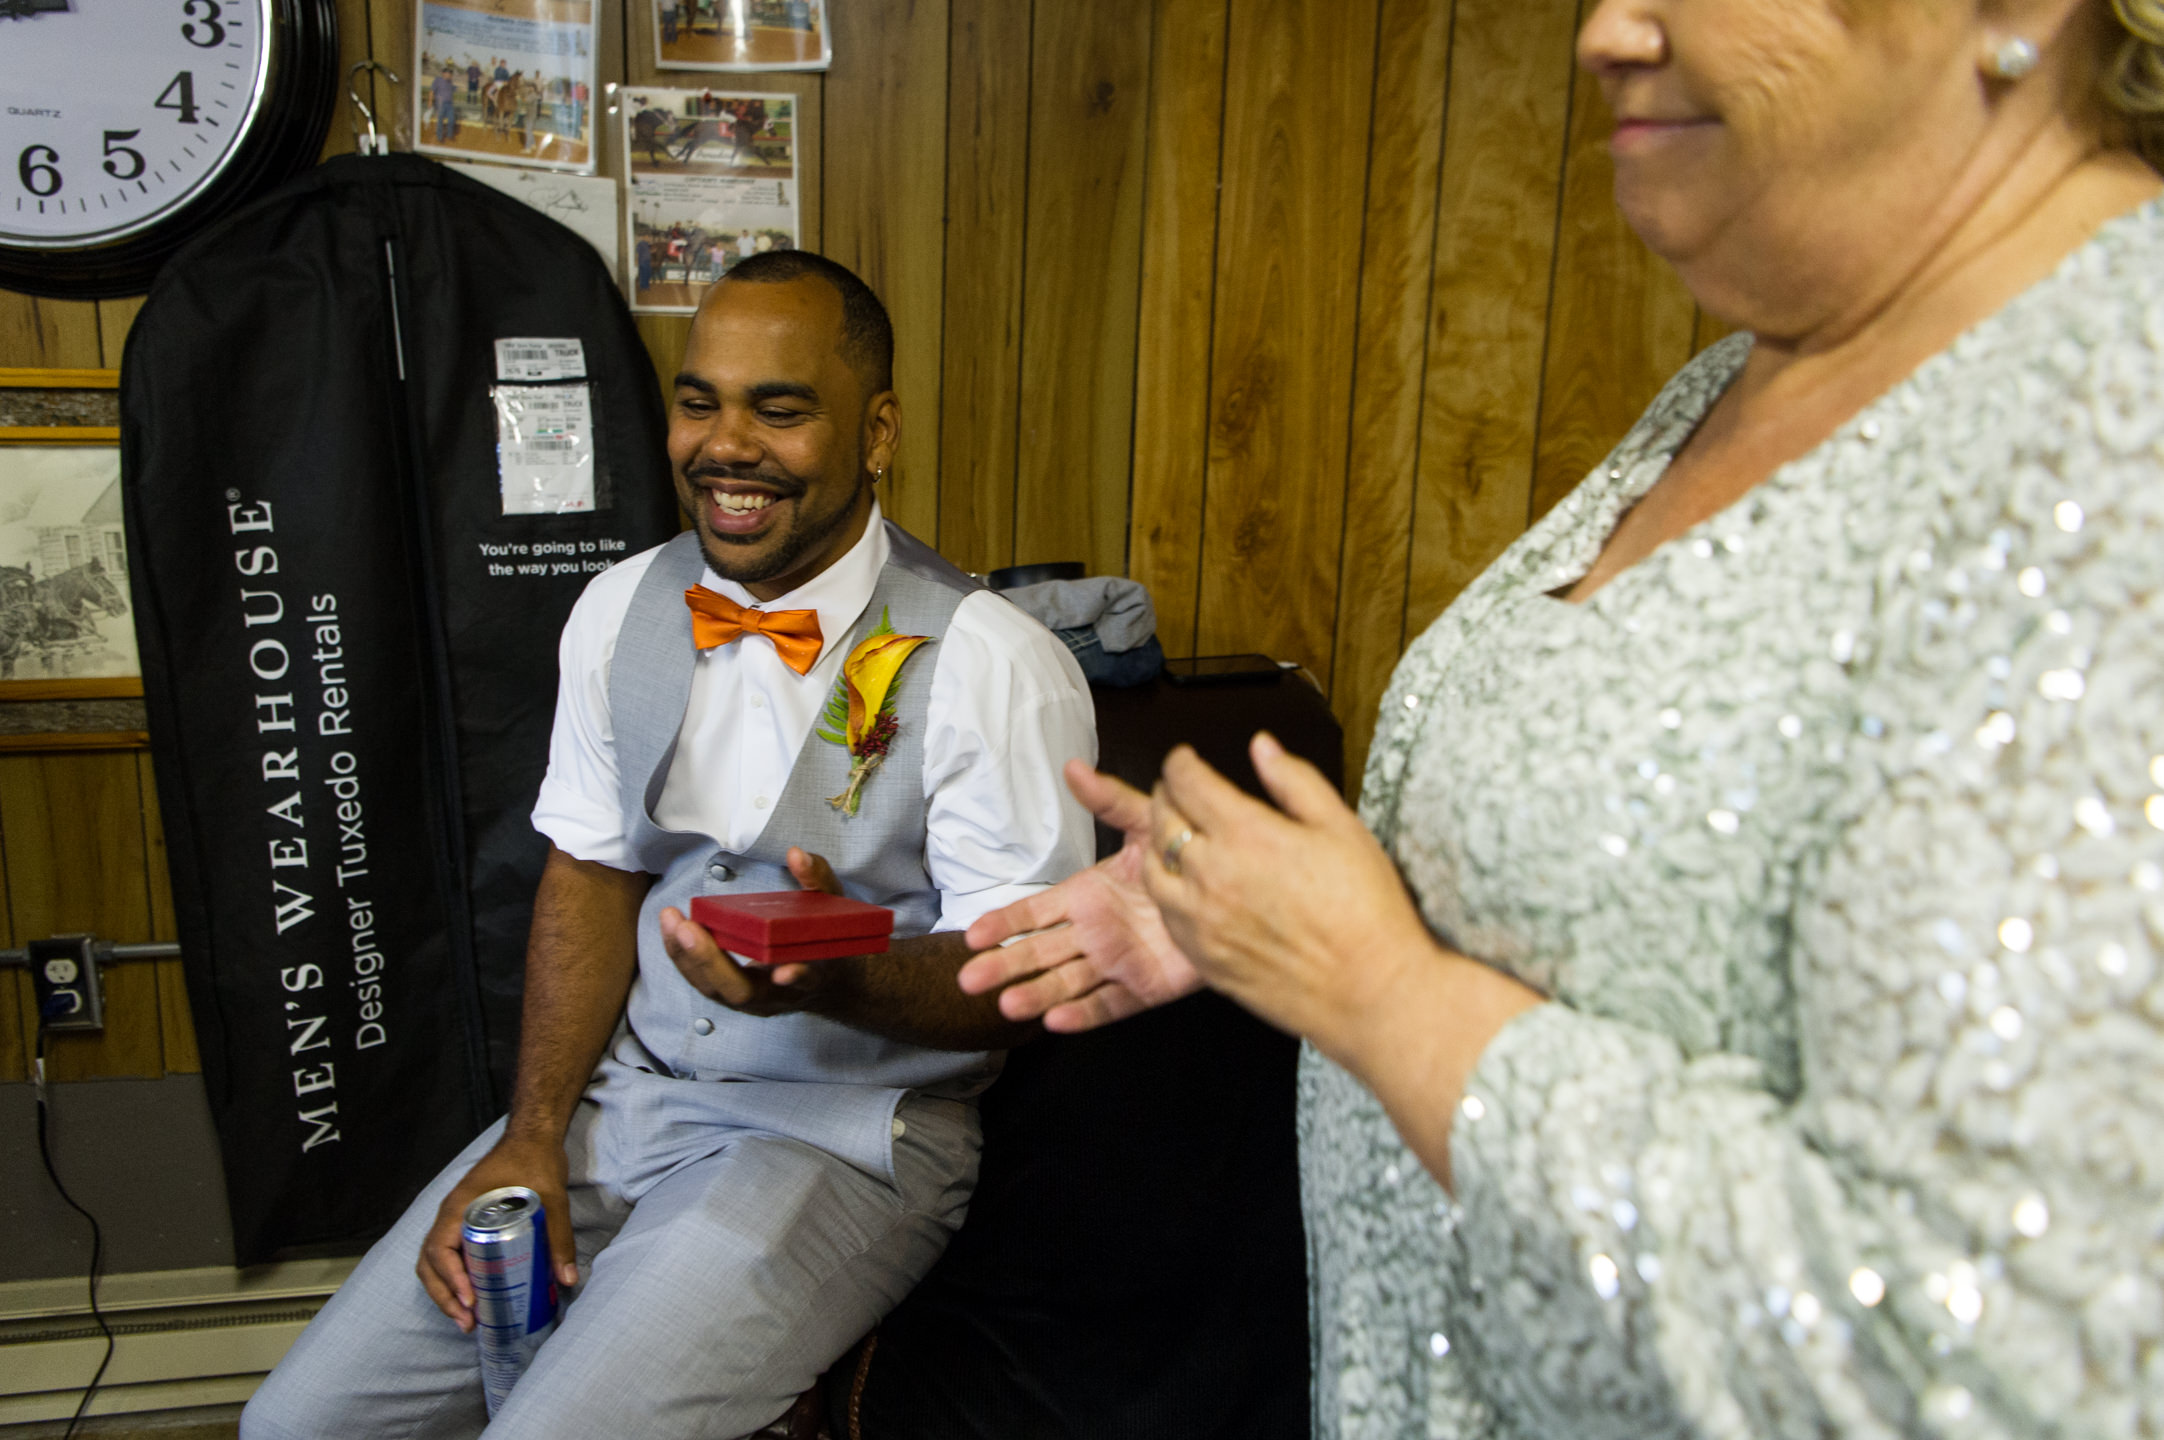 20160917_Tat_Renee and Marcus Wedding-8.jpg